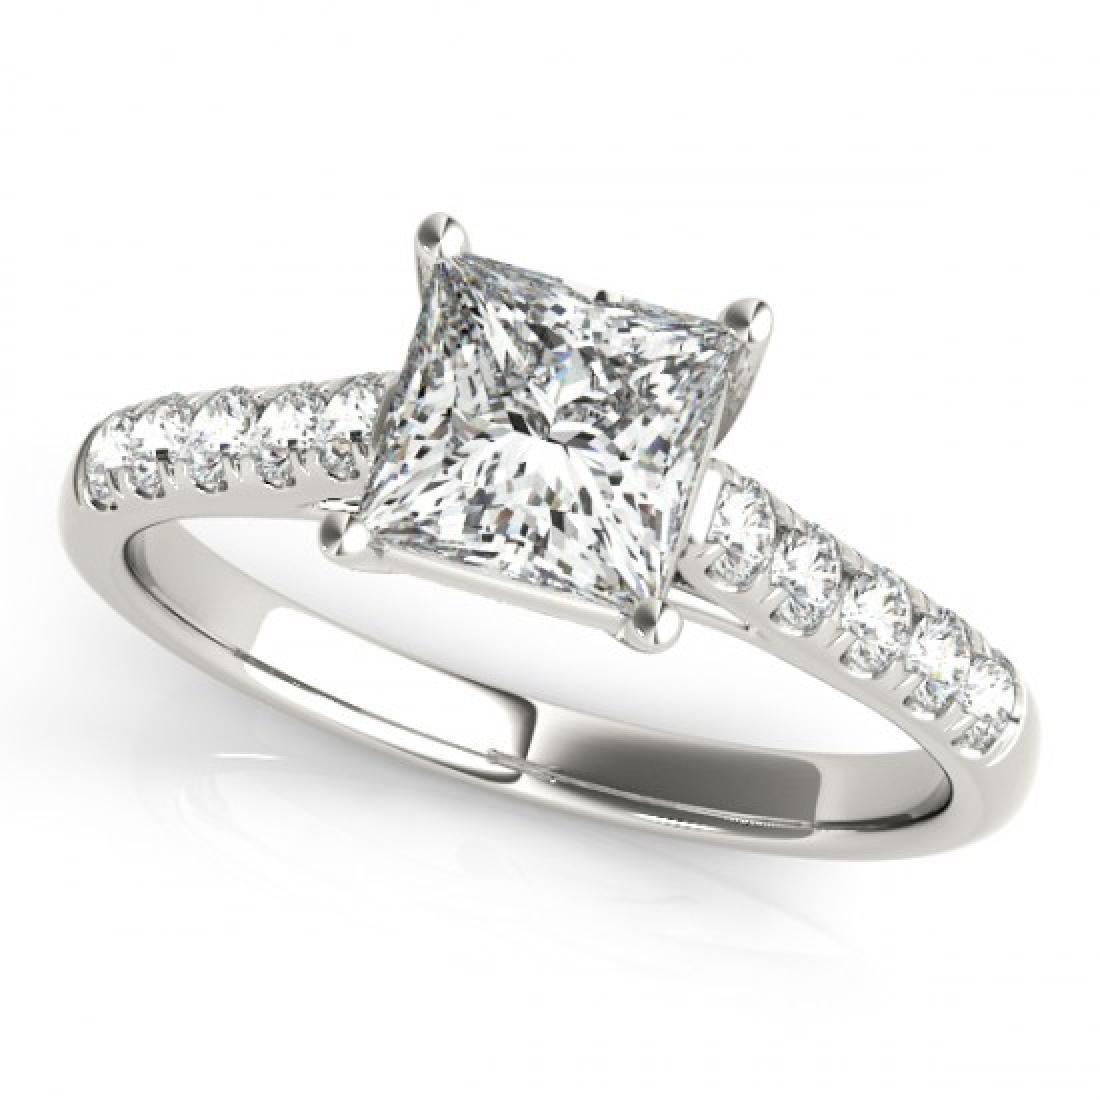 1.3 CTW Certified VS/SI Princess Diamond Ring 14K White